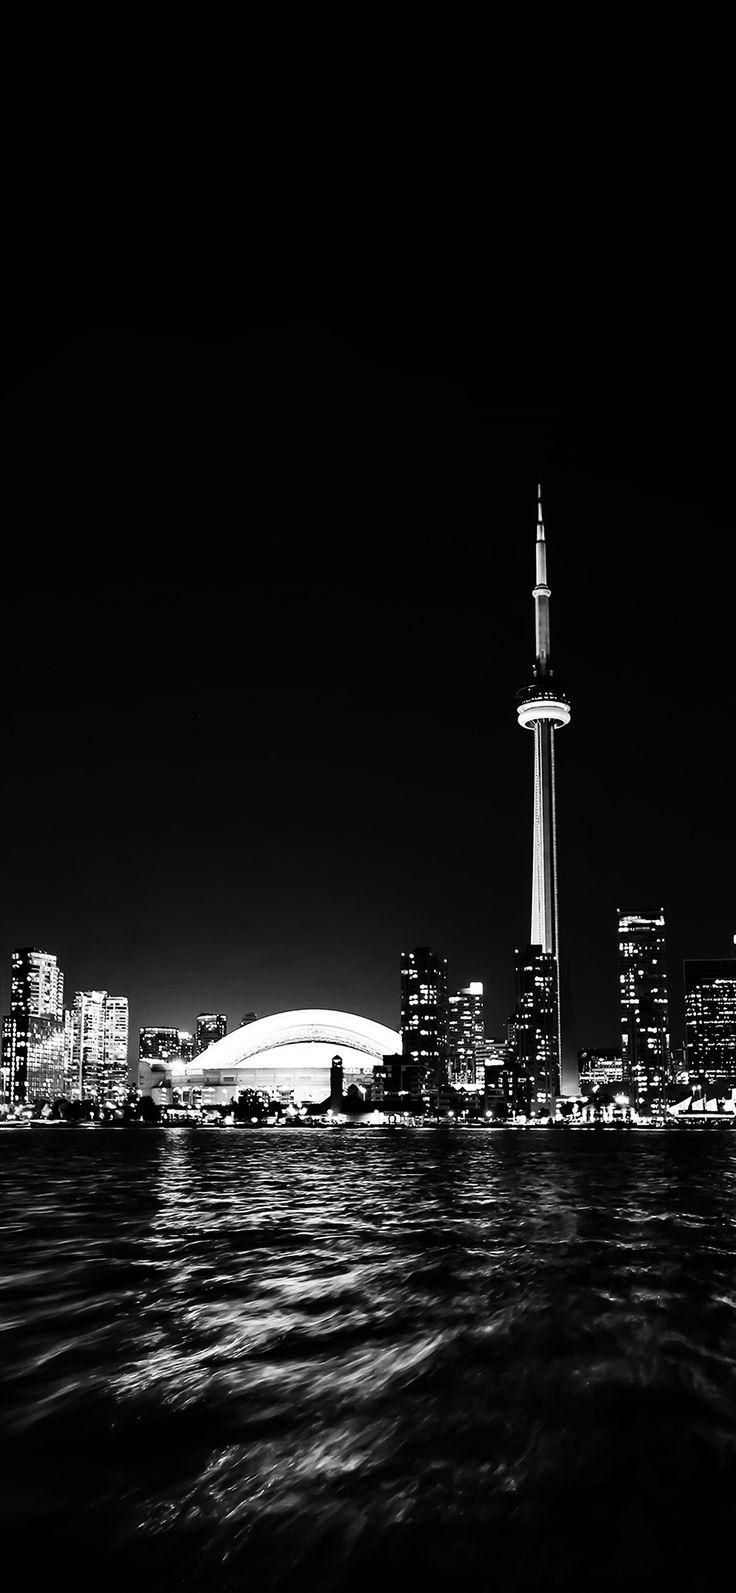 Iphone X Wallpaper Mt45 Toronto City Night Missing Tower